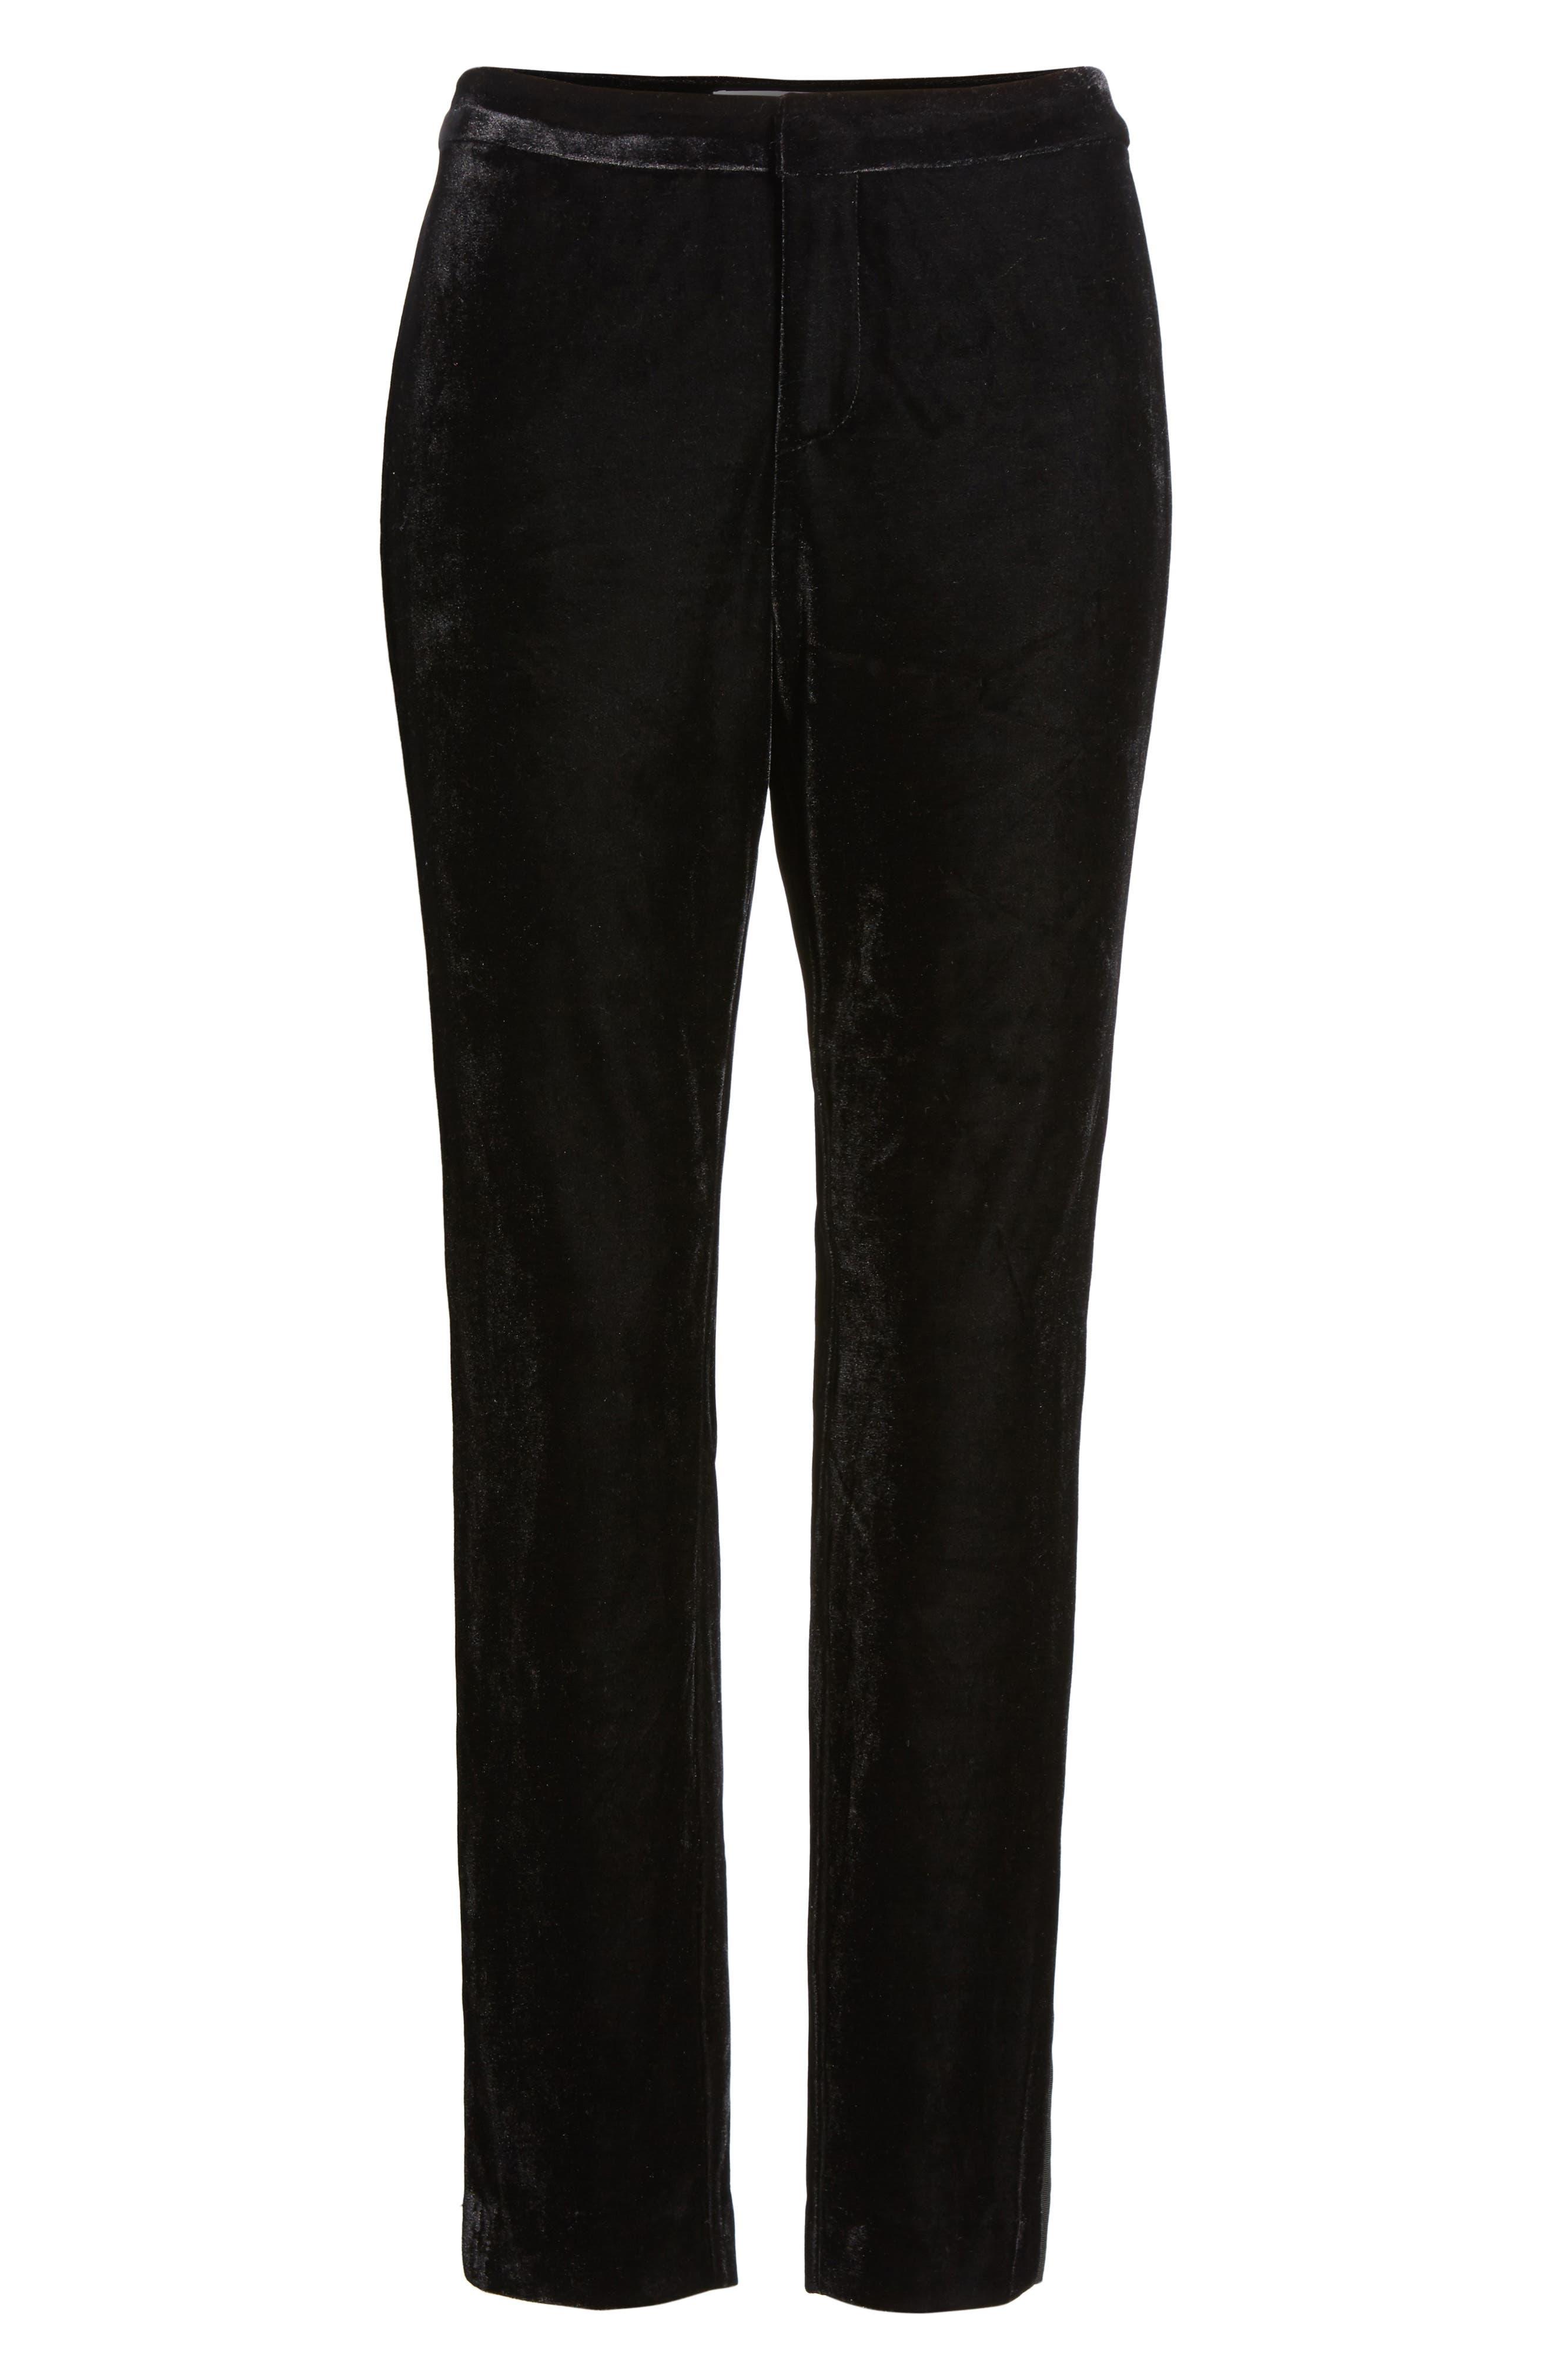 Evalina Velvet Crop Skinny Pants,                             Alternate thumbnail 6, color,                             001